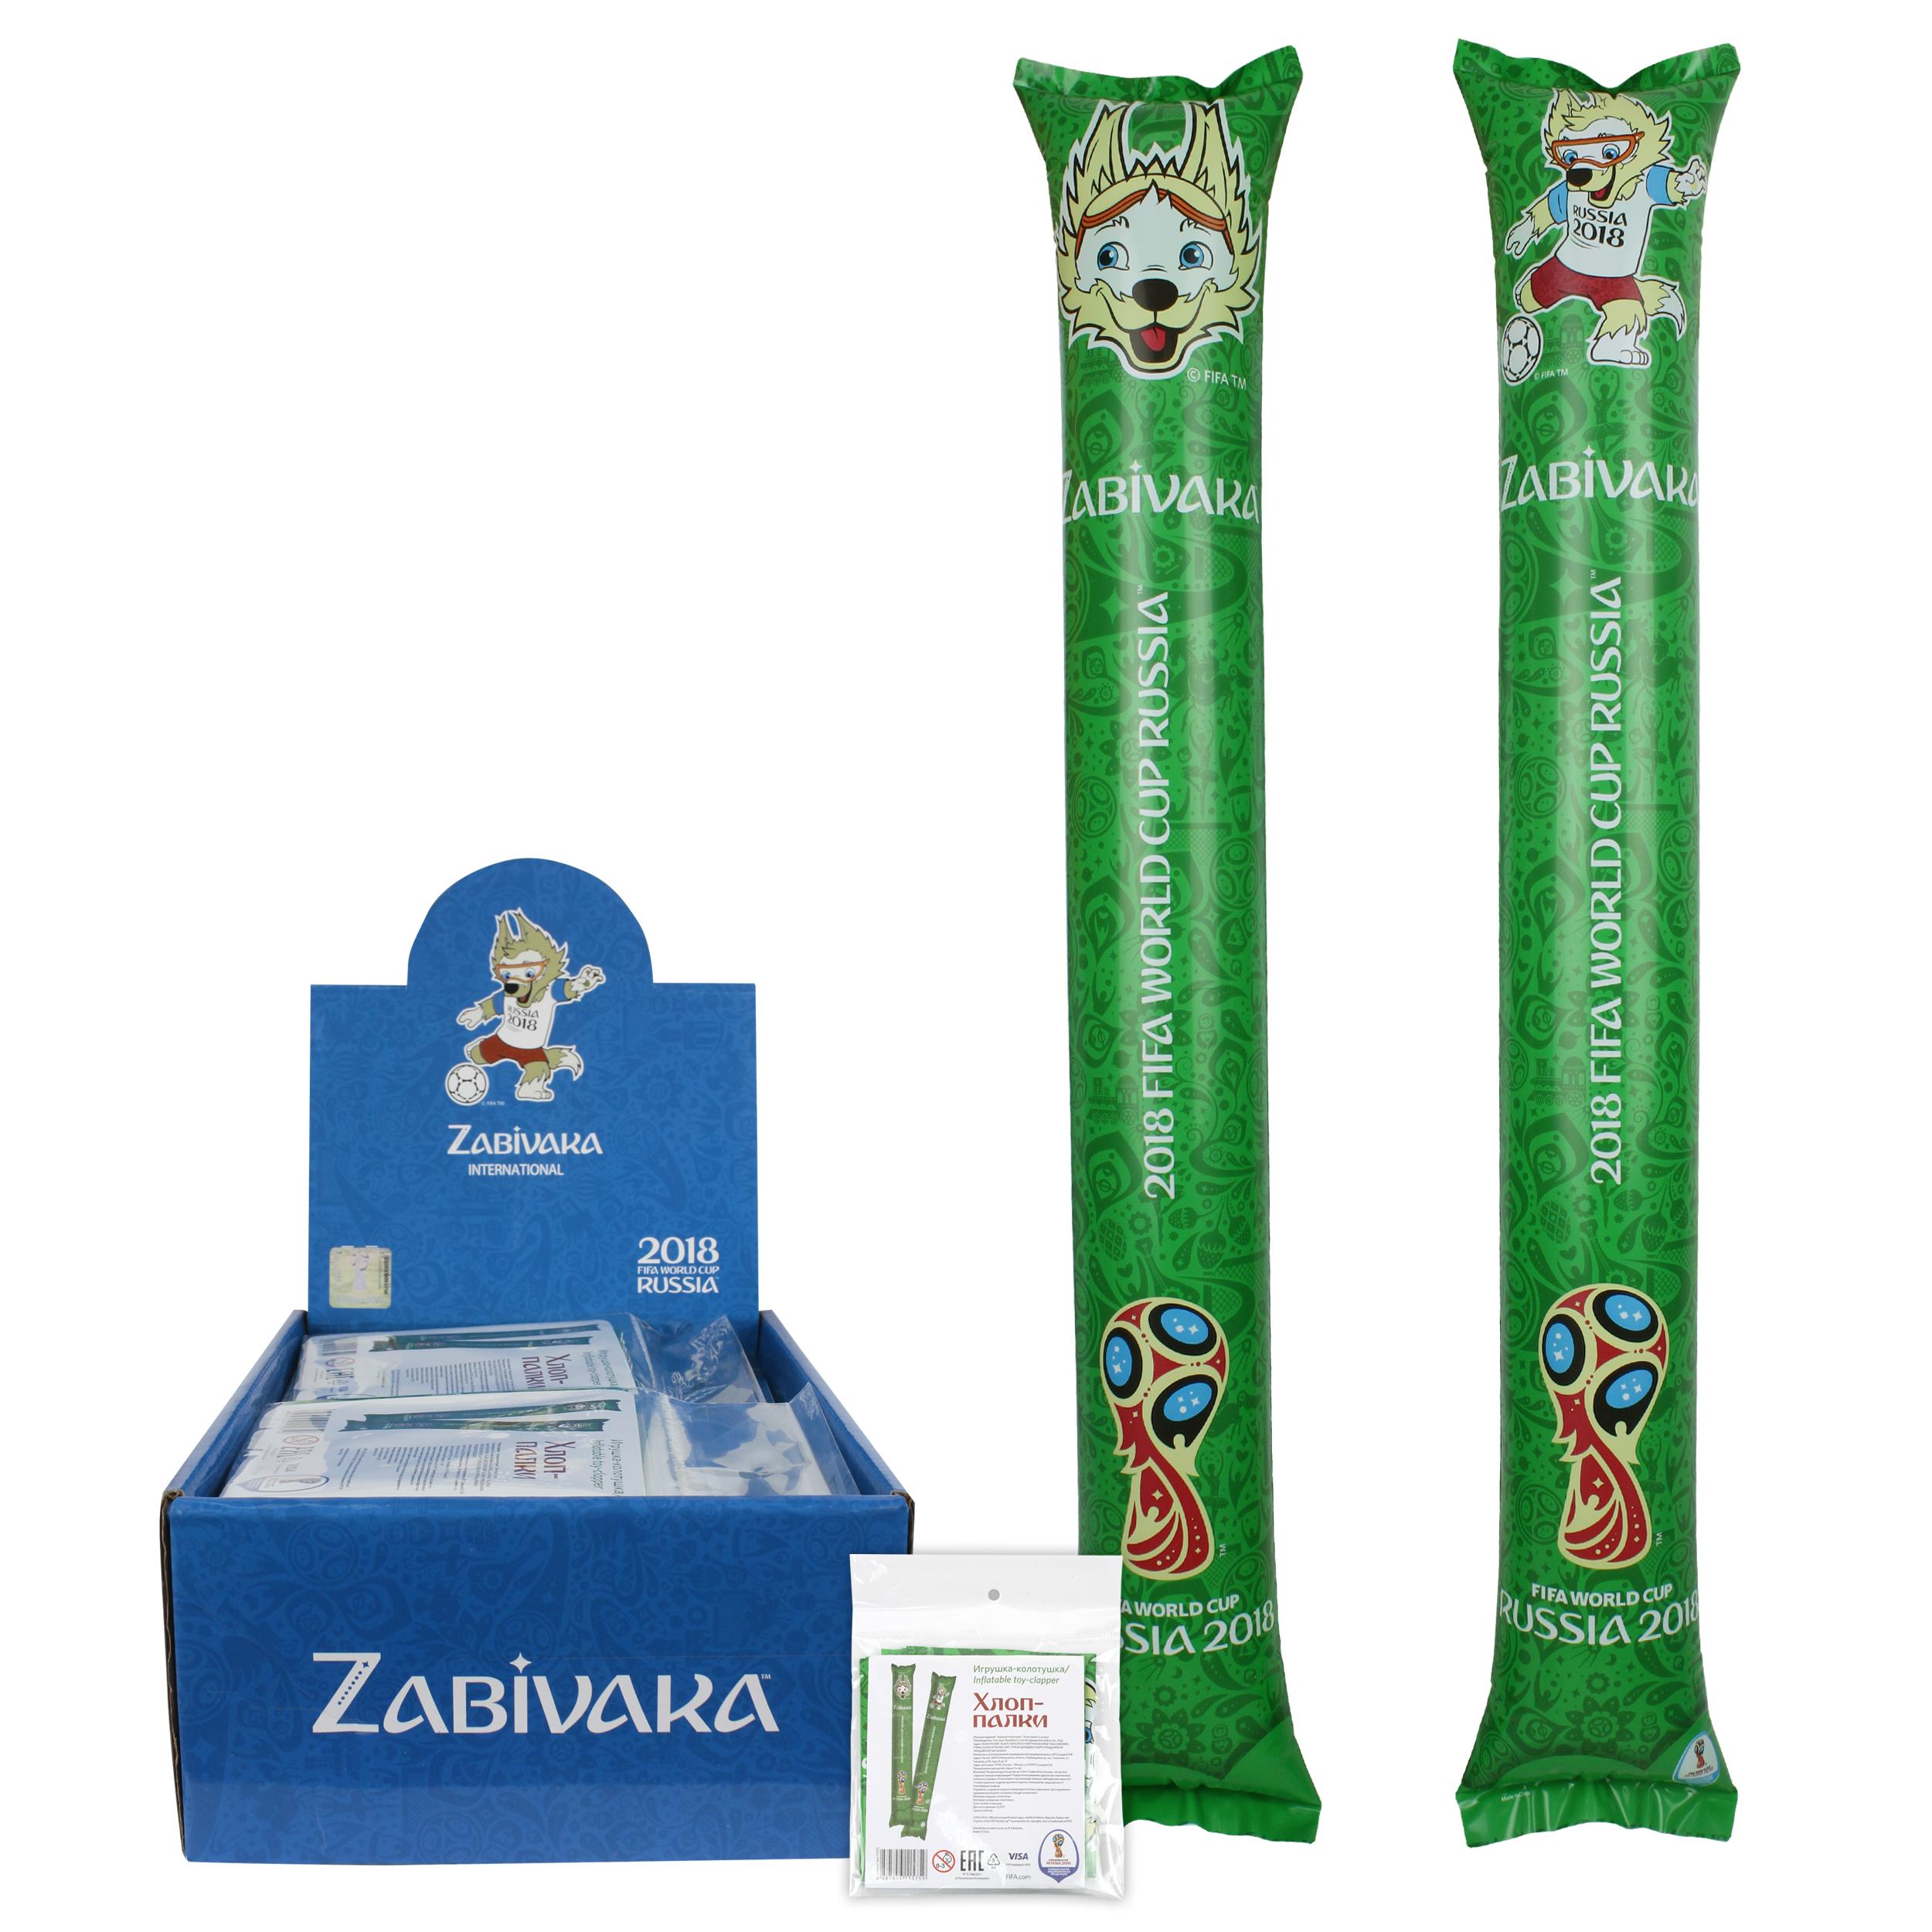 Надувная игрушка-колотушка FIFA FIFA «Хлоп-палки» 2 шт. 60х10 см цена 2017